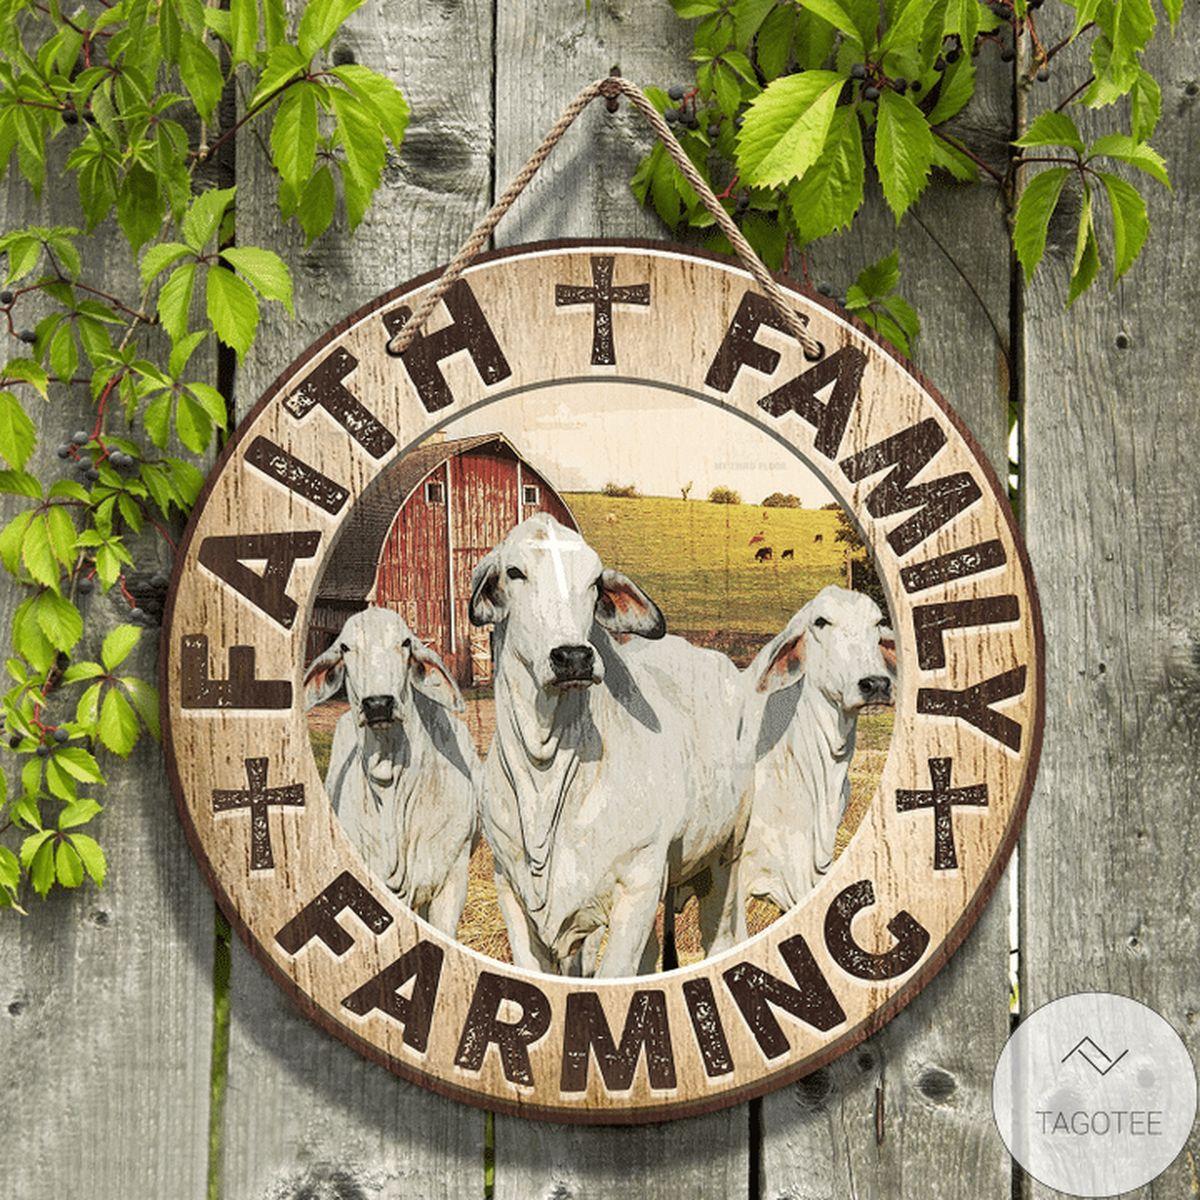 Brahman Cattle Faith Family Farming Round Wooden Sign